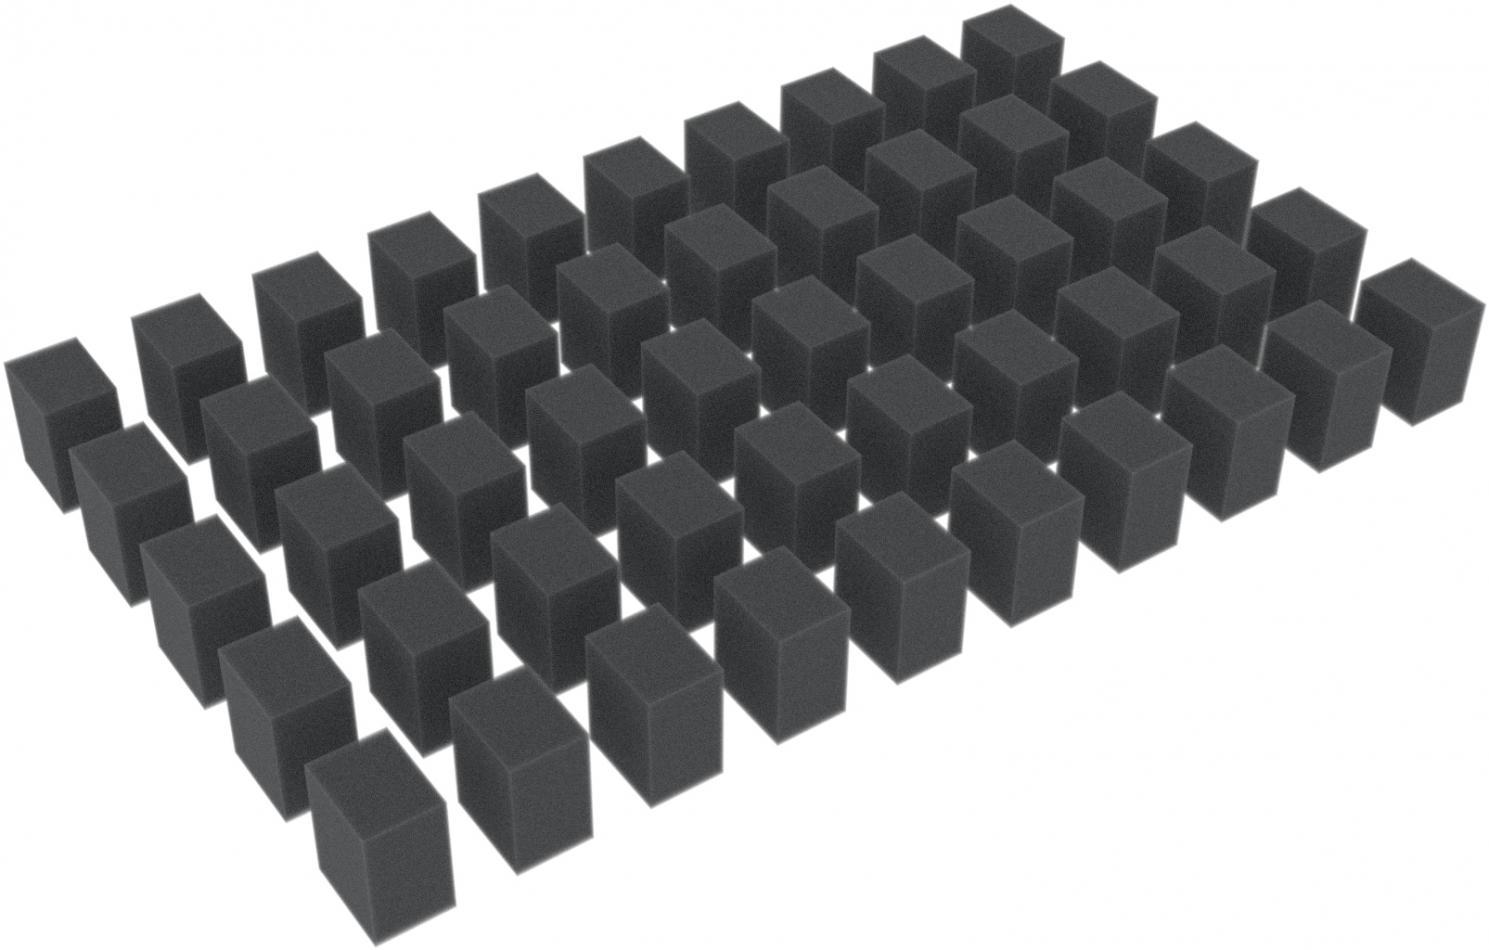 50 spacers / foam blocks / cuboids 25 mm x 20 mm x 15 mm